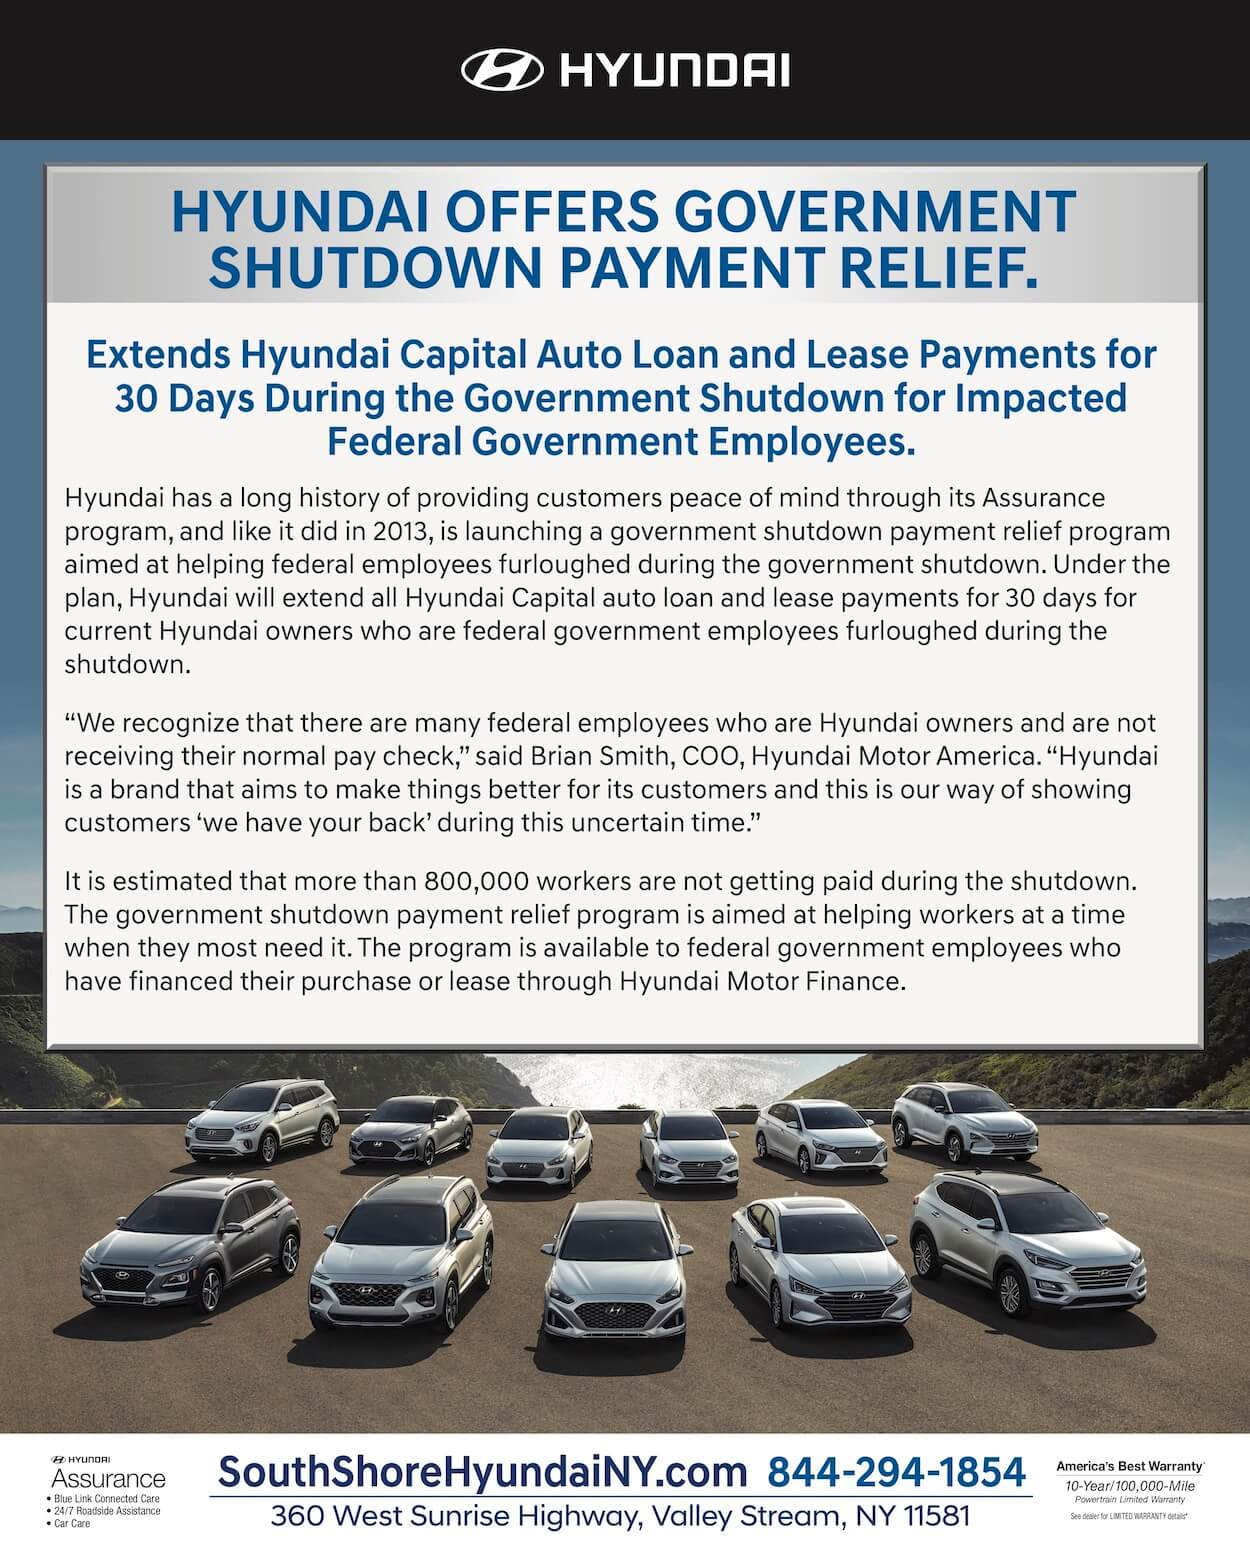 hyundai government shutdown payment relief